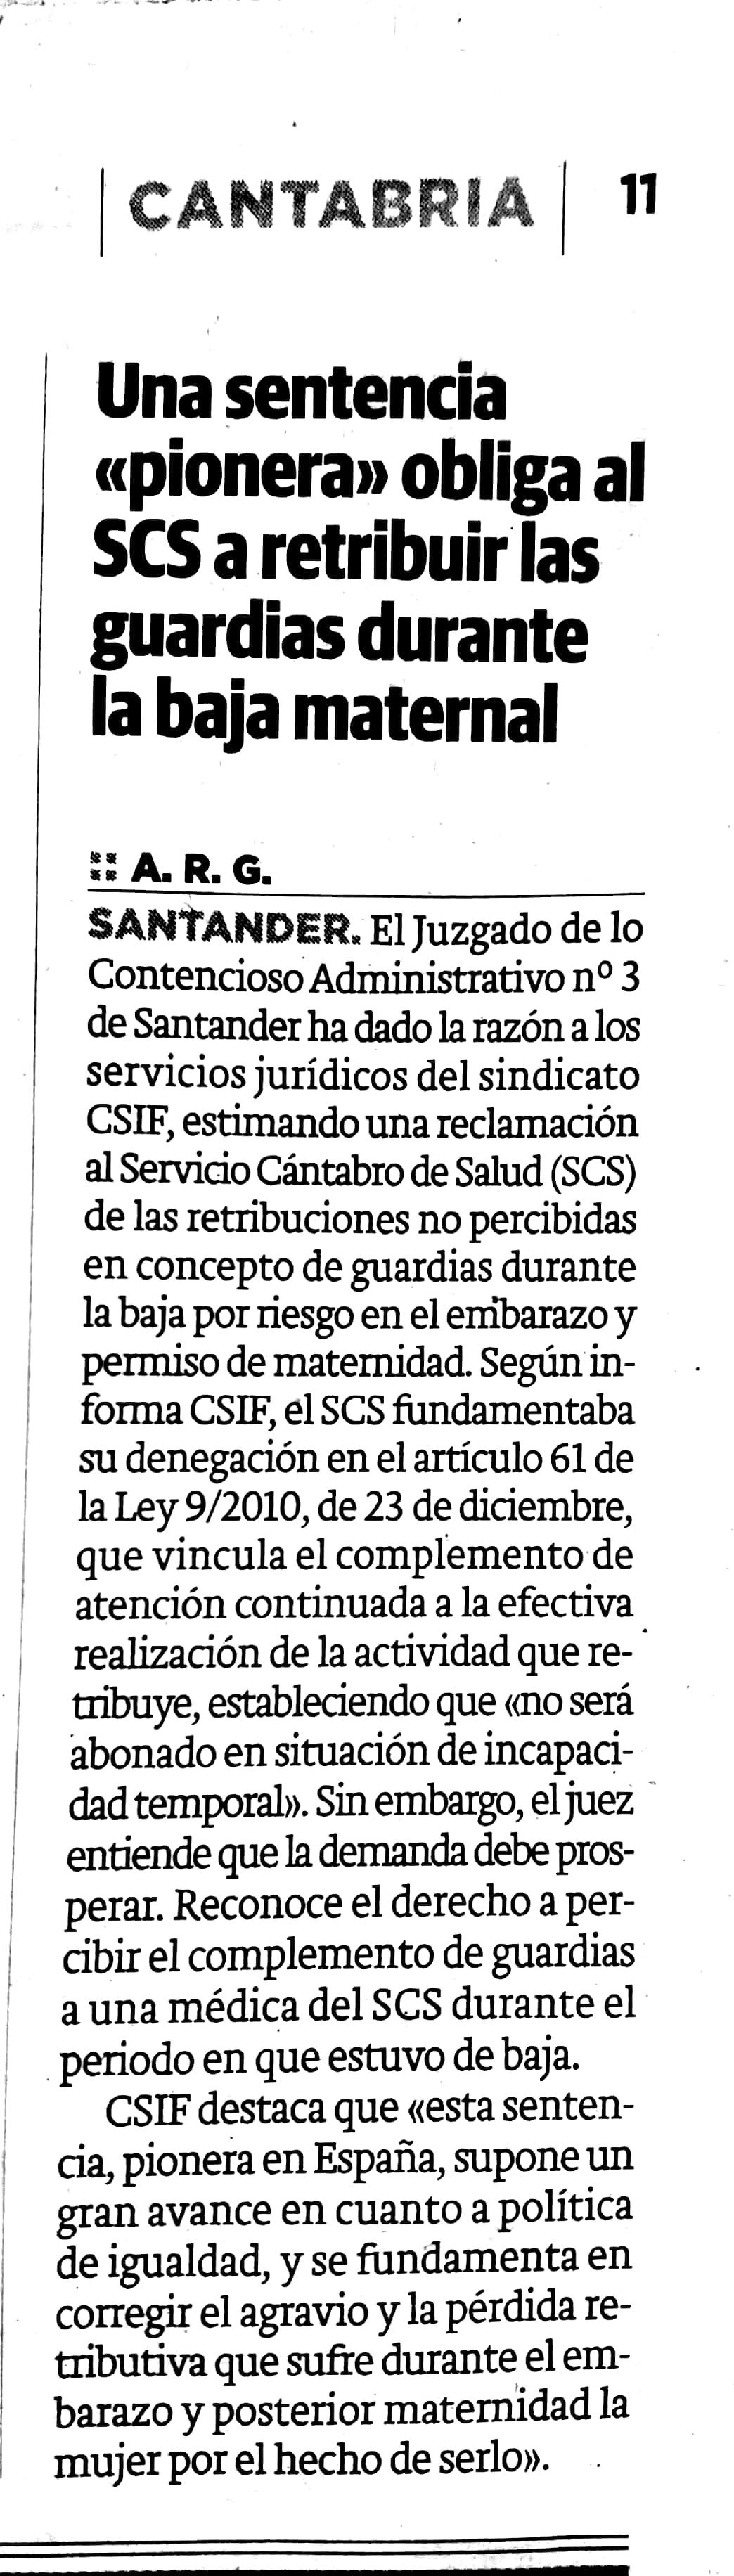 https://www.csif.es/sites/default/files/field/image/Imagen%20sentencia.JPG